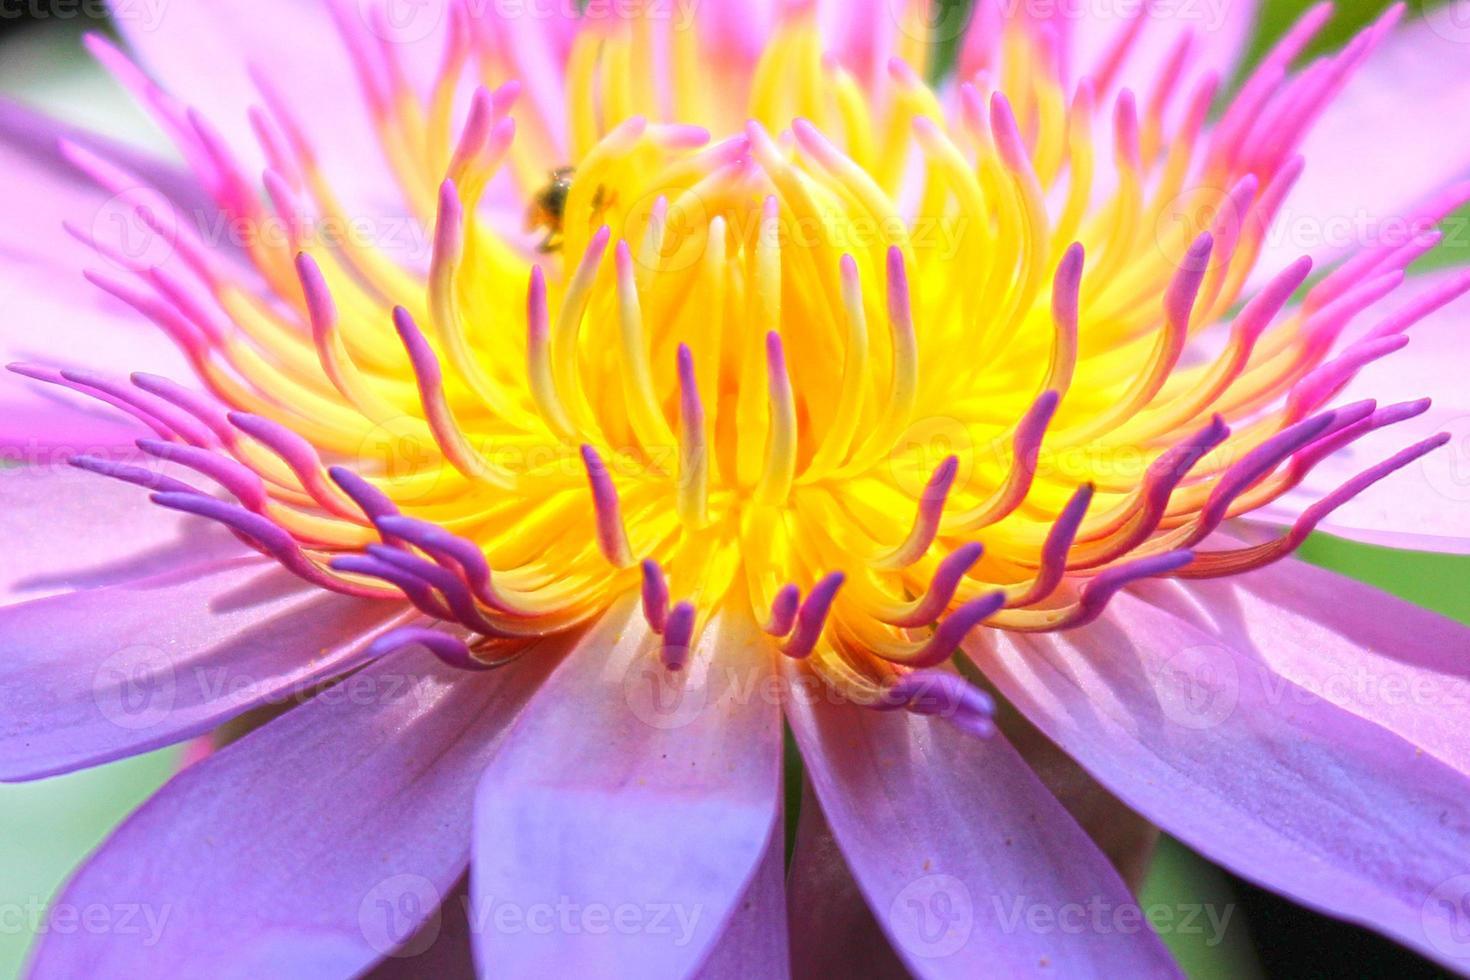 närbild pollen lotusblomma. foto